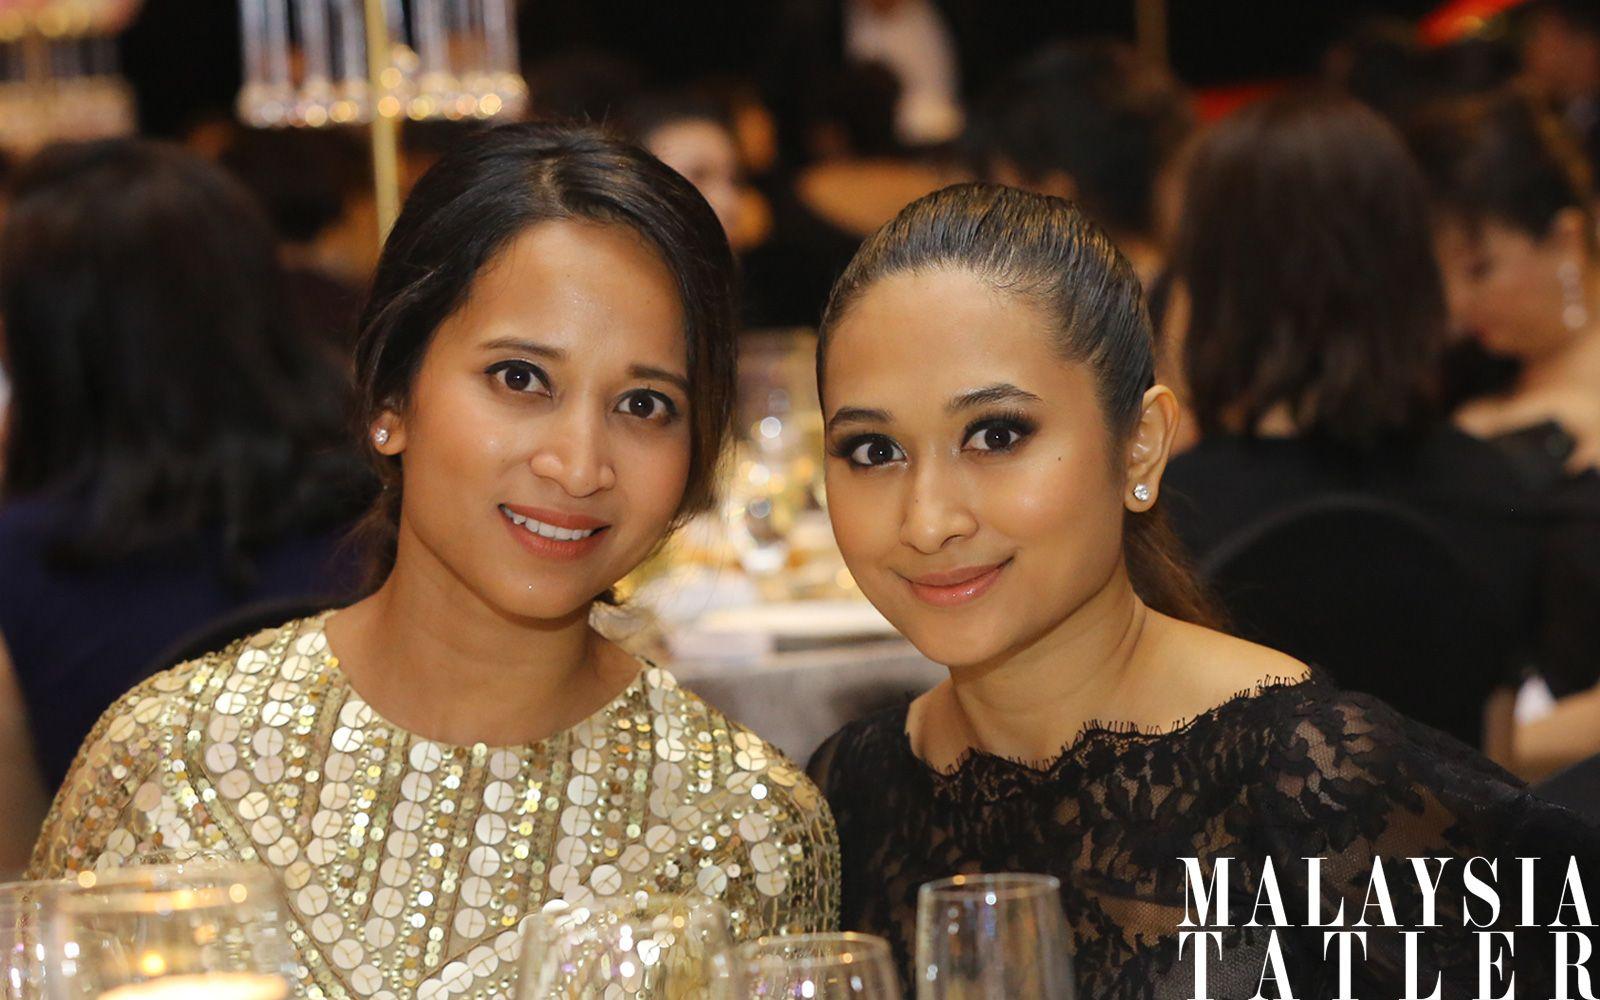 Nur Diana Nasimuddin and Nur Nadia Nasimuddin